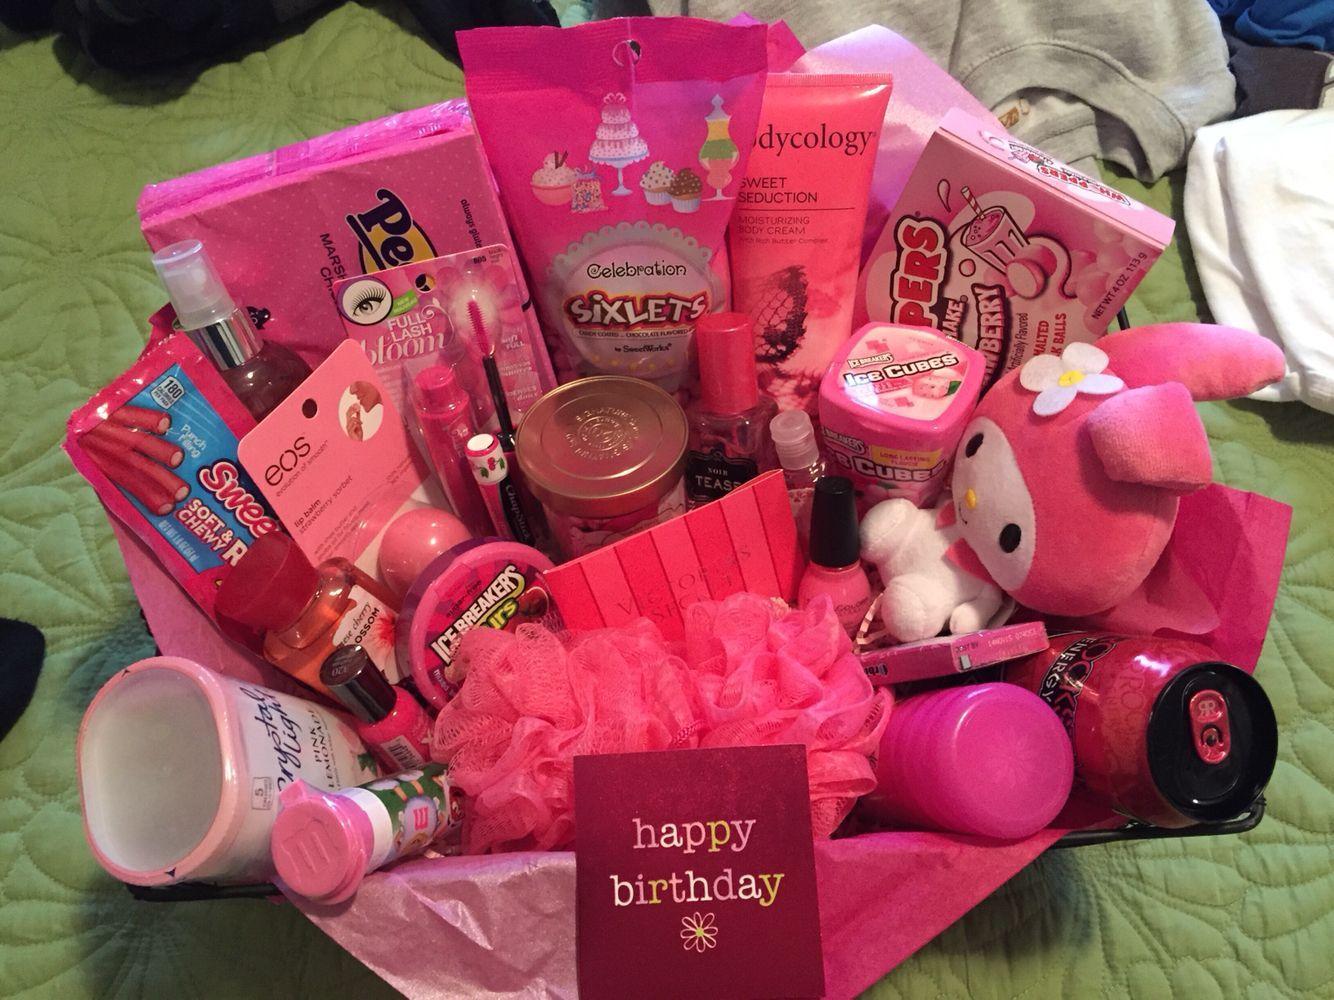 Pink themed basket birthdaybasket in 2020 Diy mother's